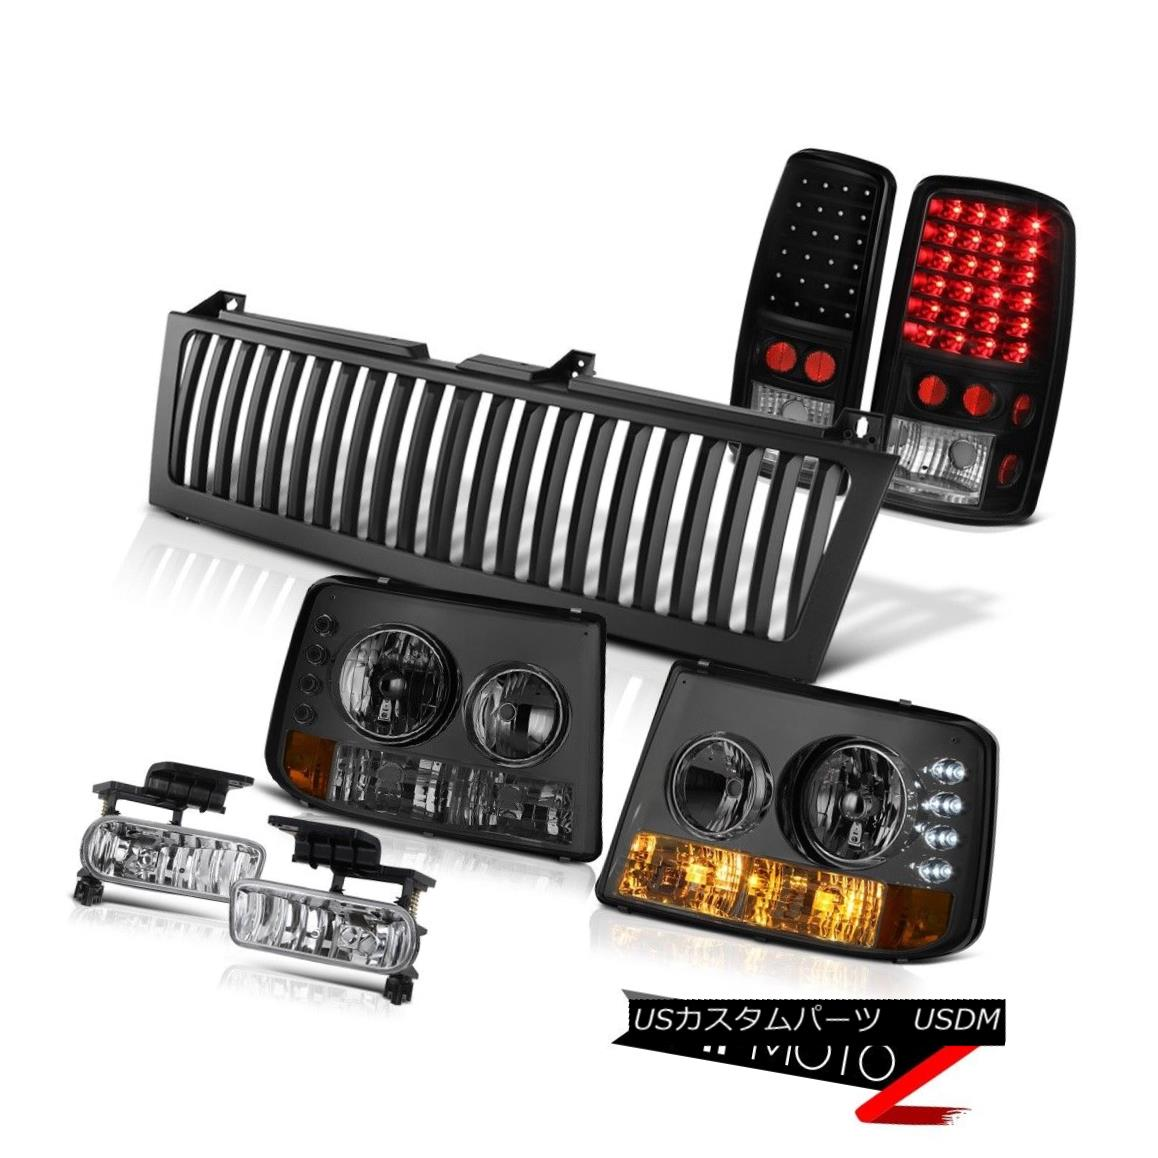 LED Headlight 9005 High Beam Light For Subaru Impreza WRX STI Chevrolet Equinox